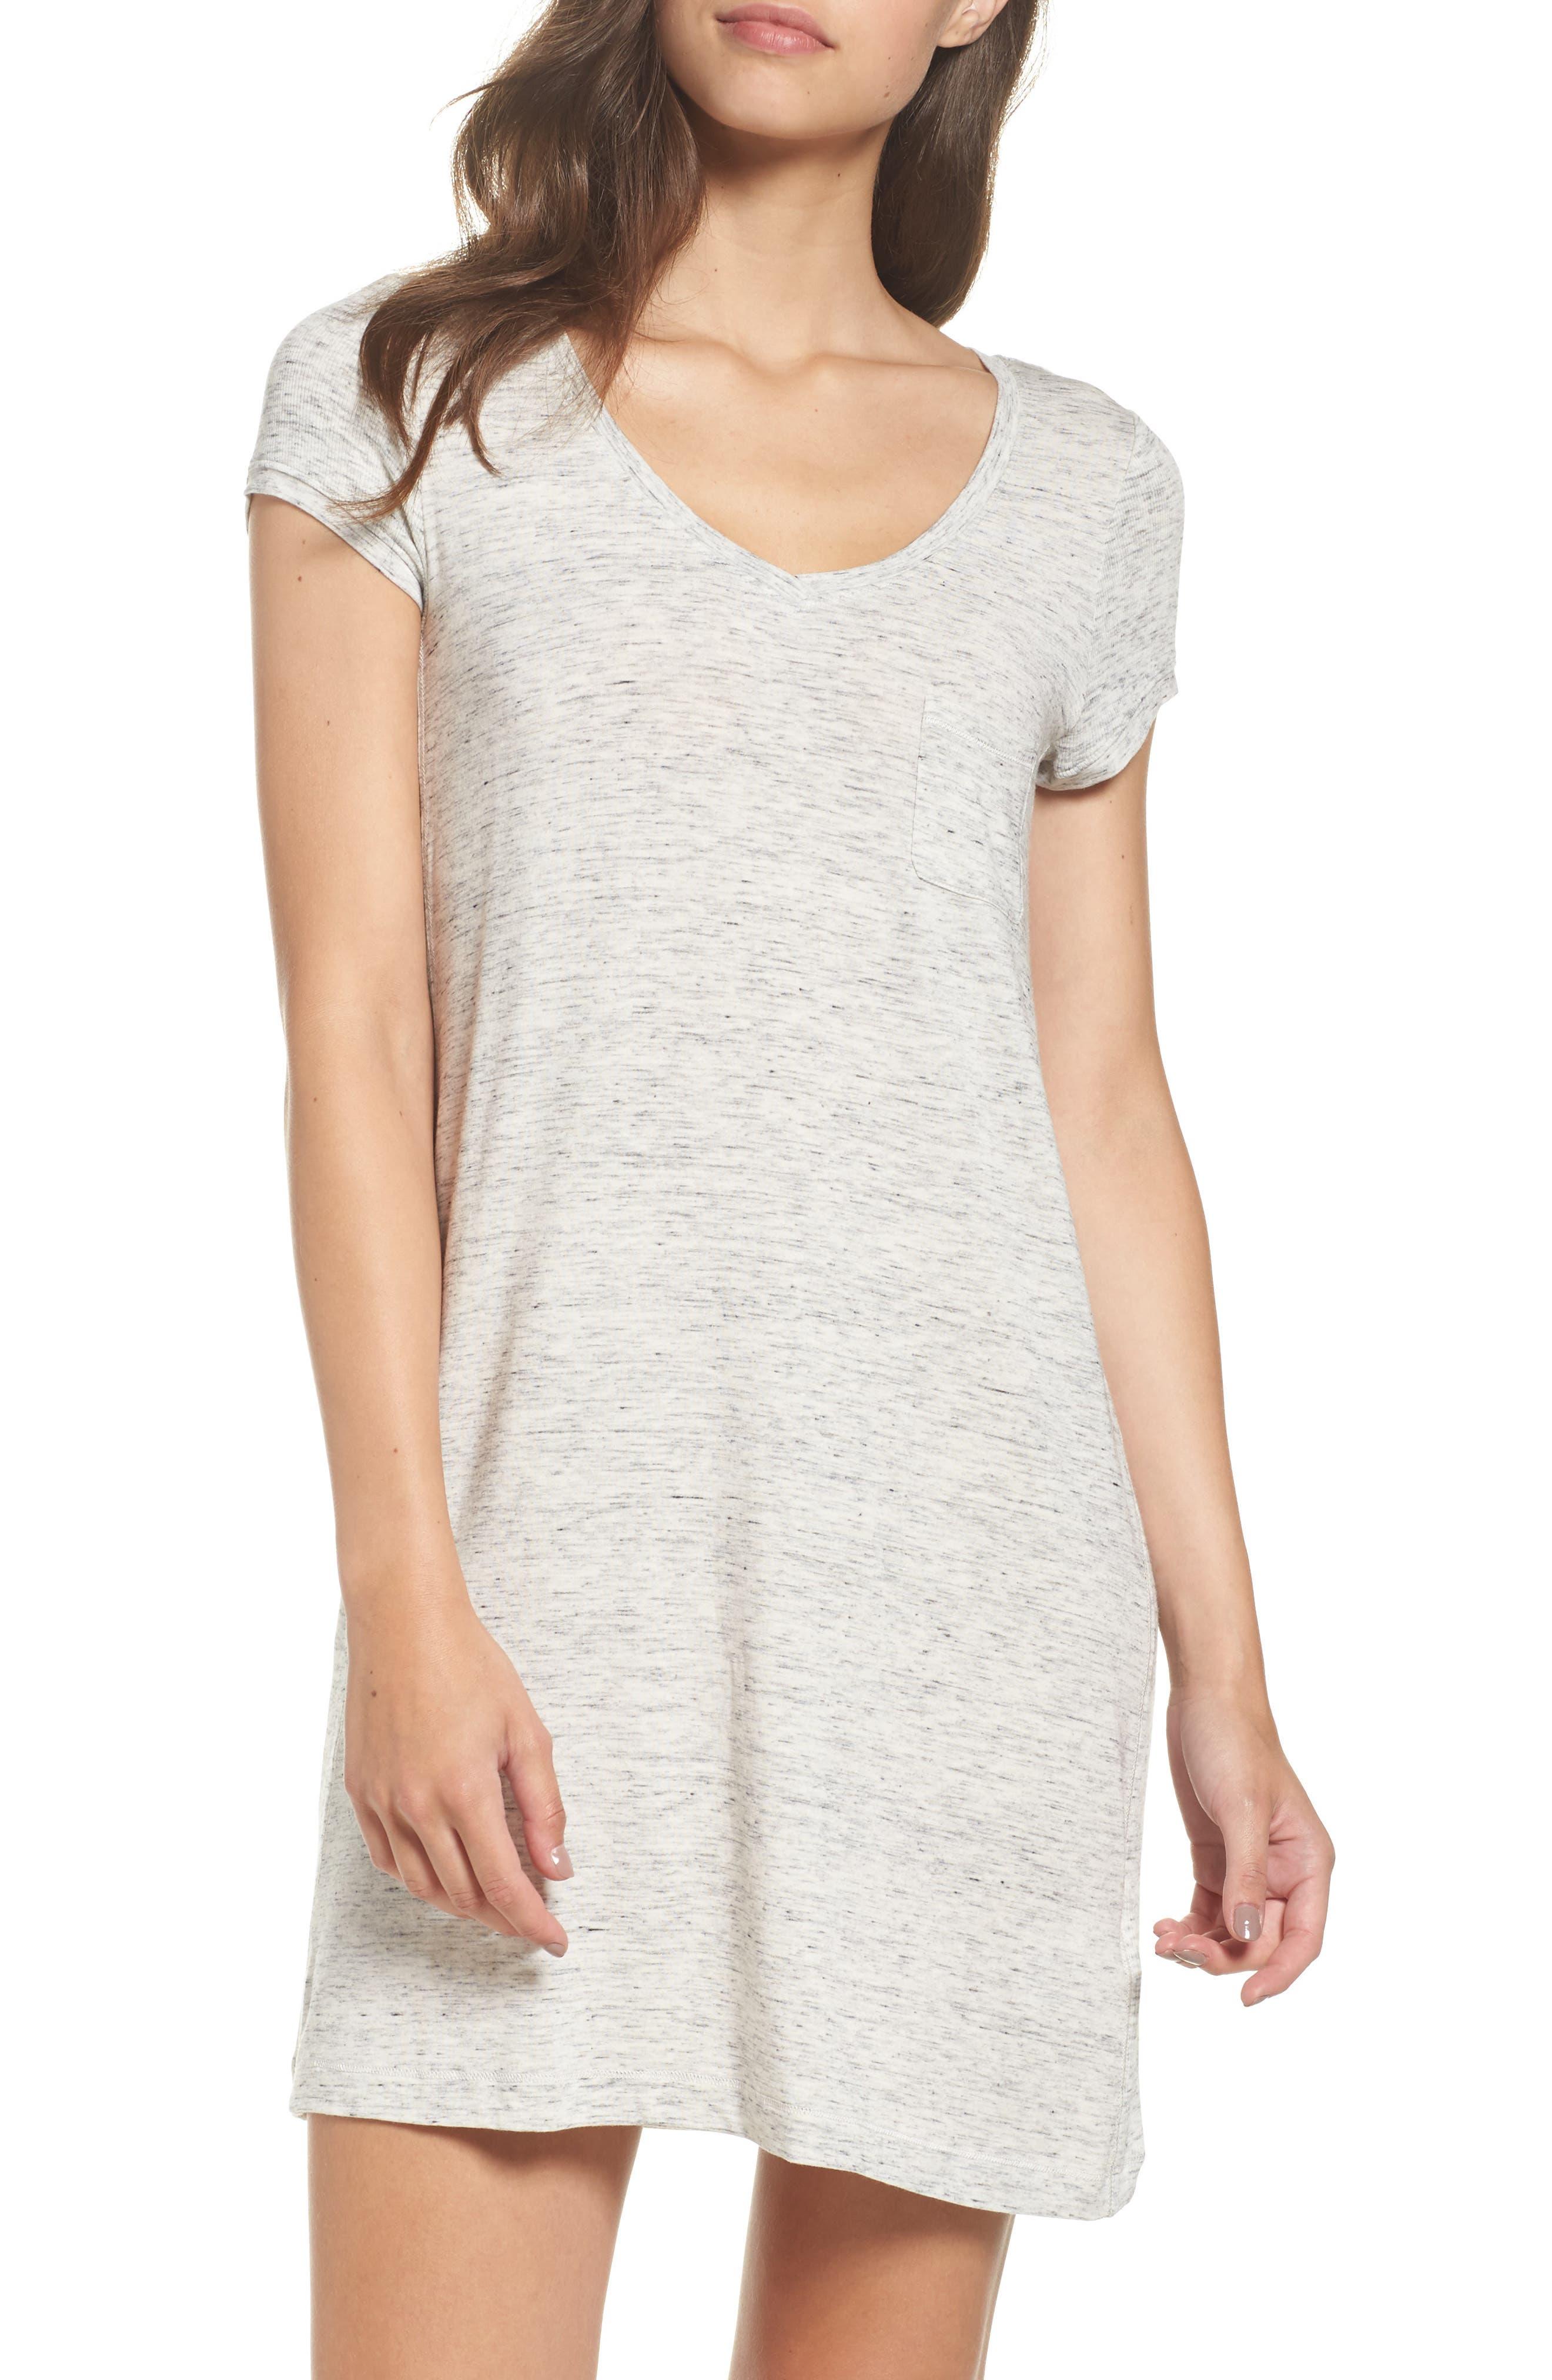 'City Essentials' V-Neck Sleep Shirt,                             Main thumbnail 1, color,                             Light Gray Heather